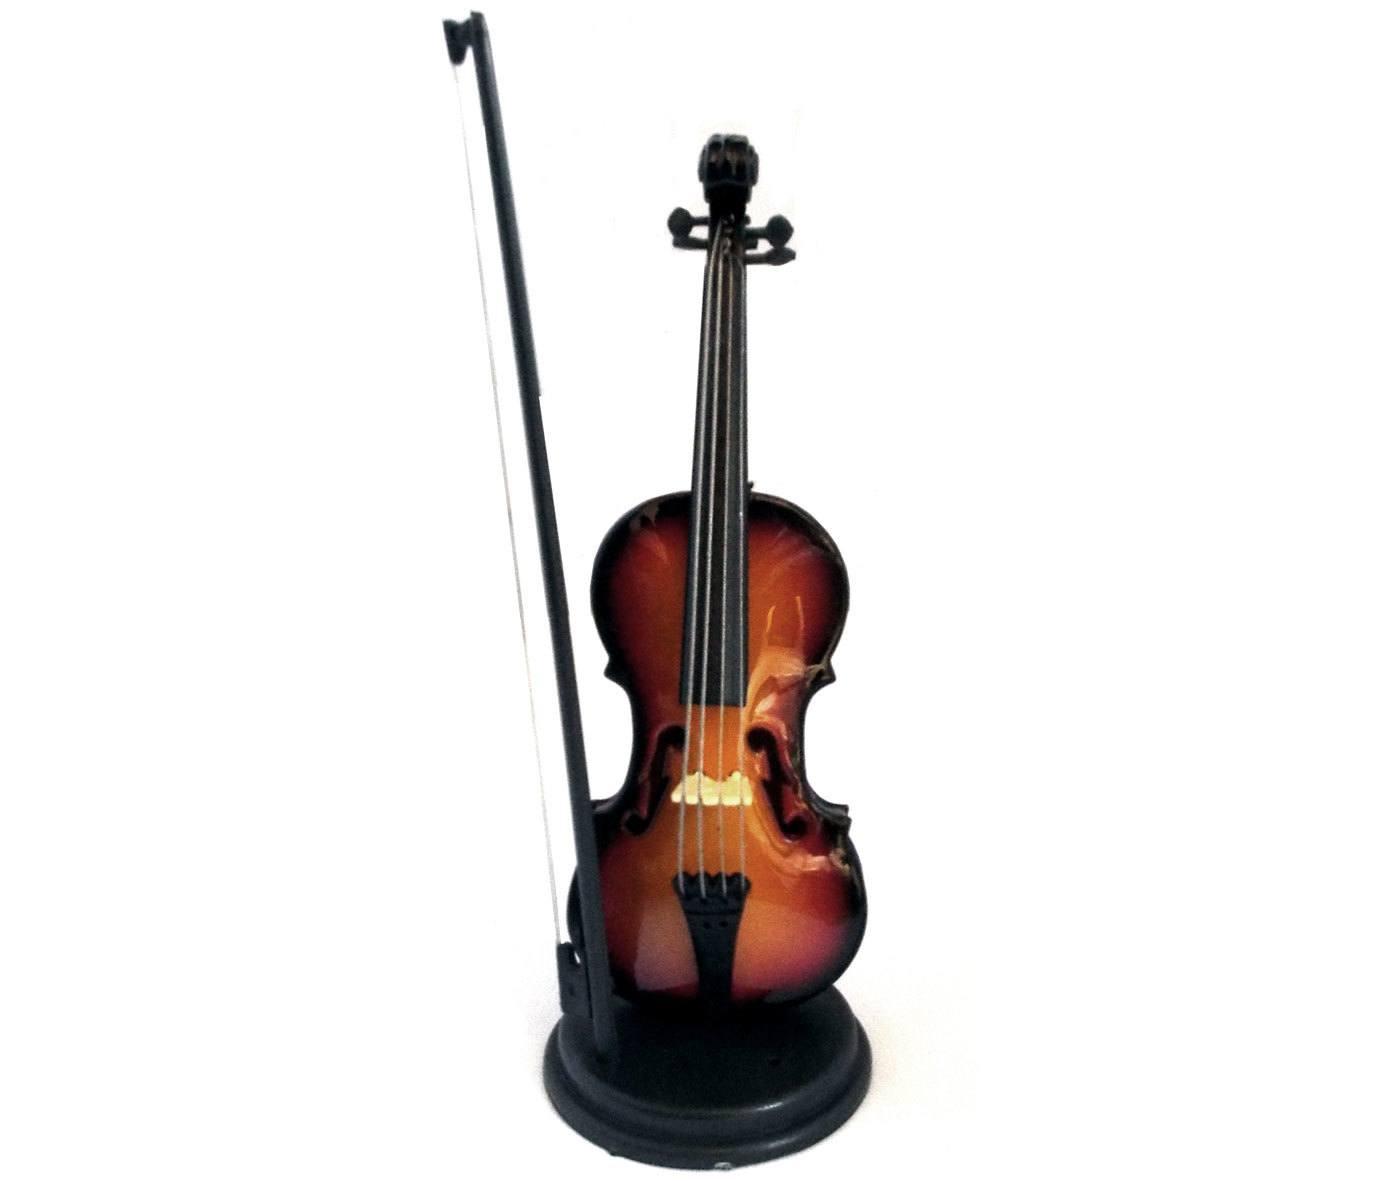 Miniatura violoncelo 15cm